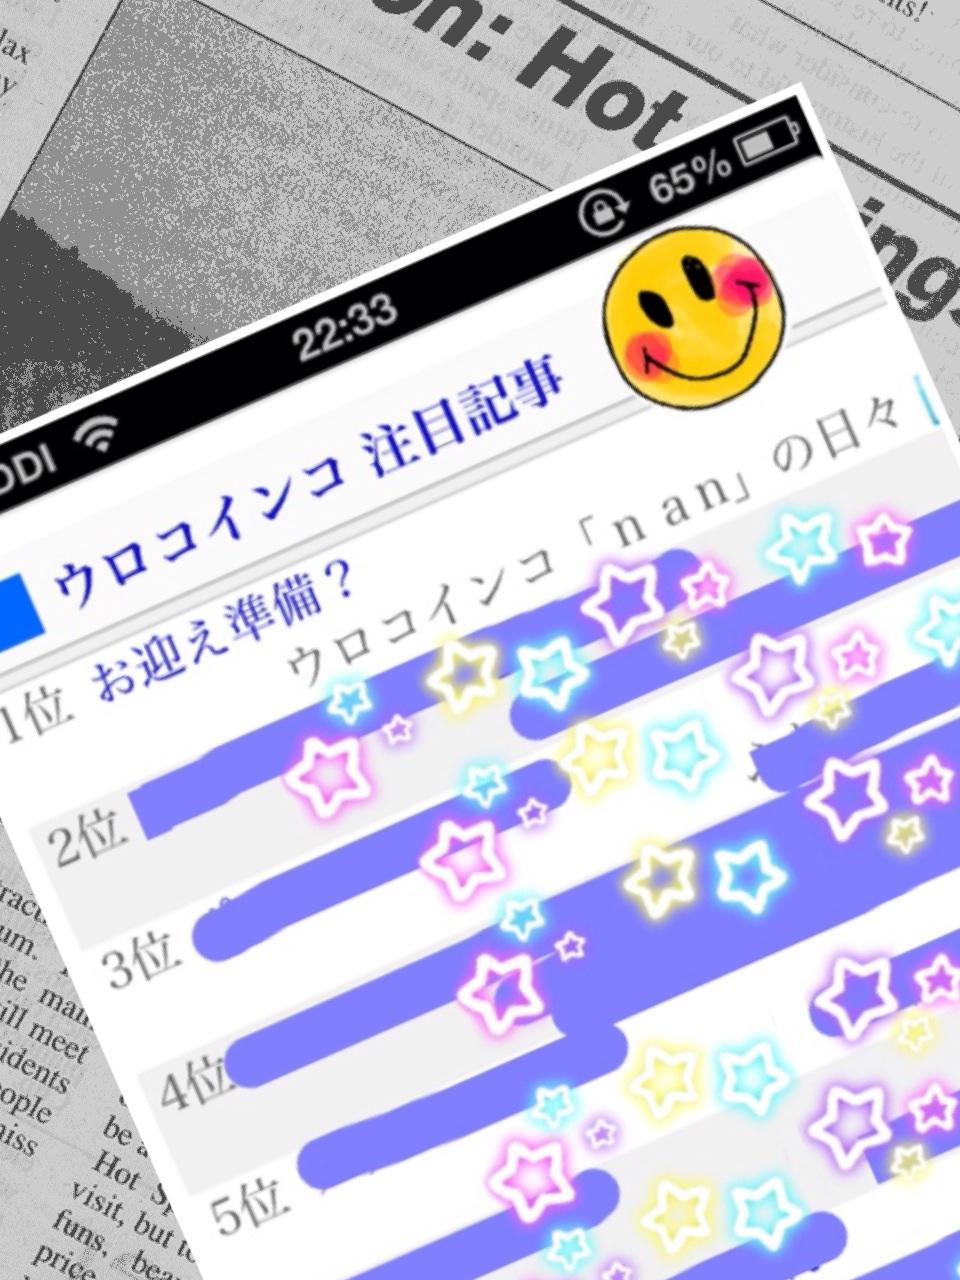 image_20130529224353.jpg